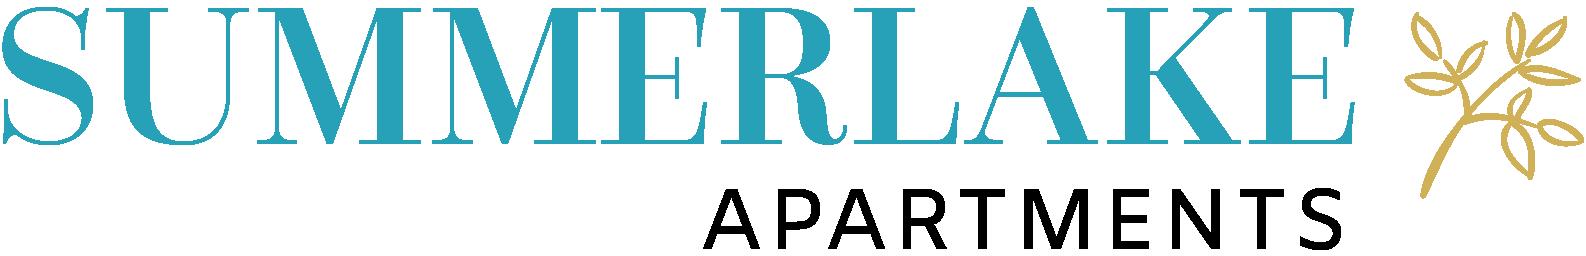 Summerlake Apartments Logo